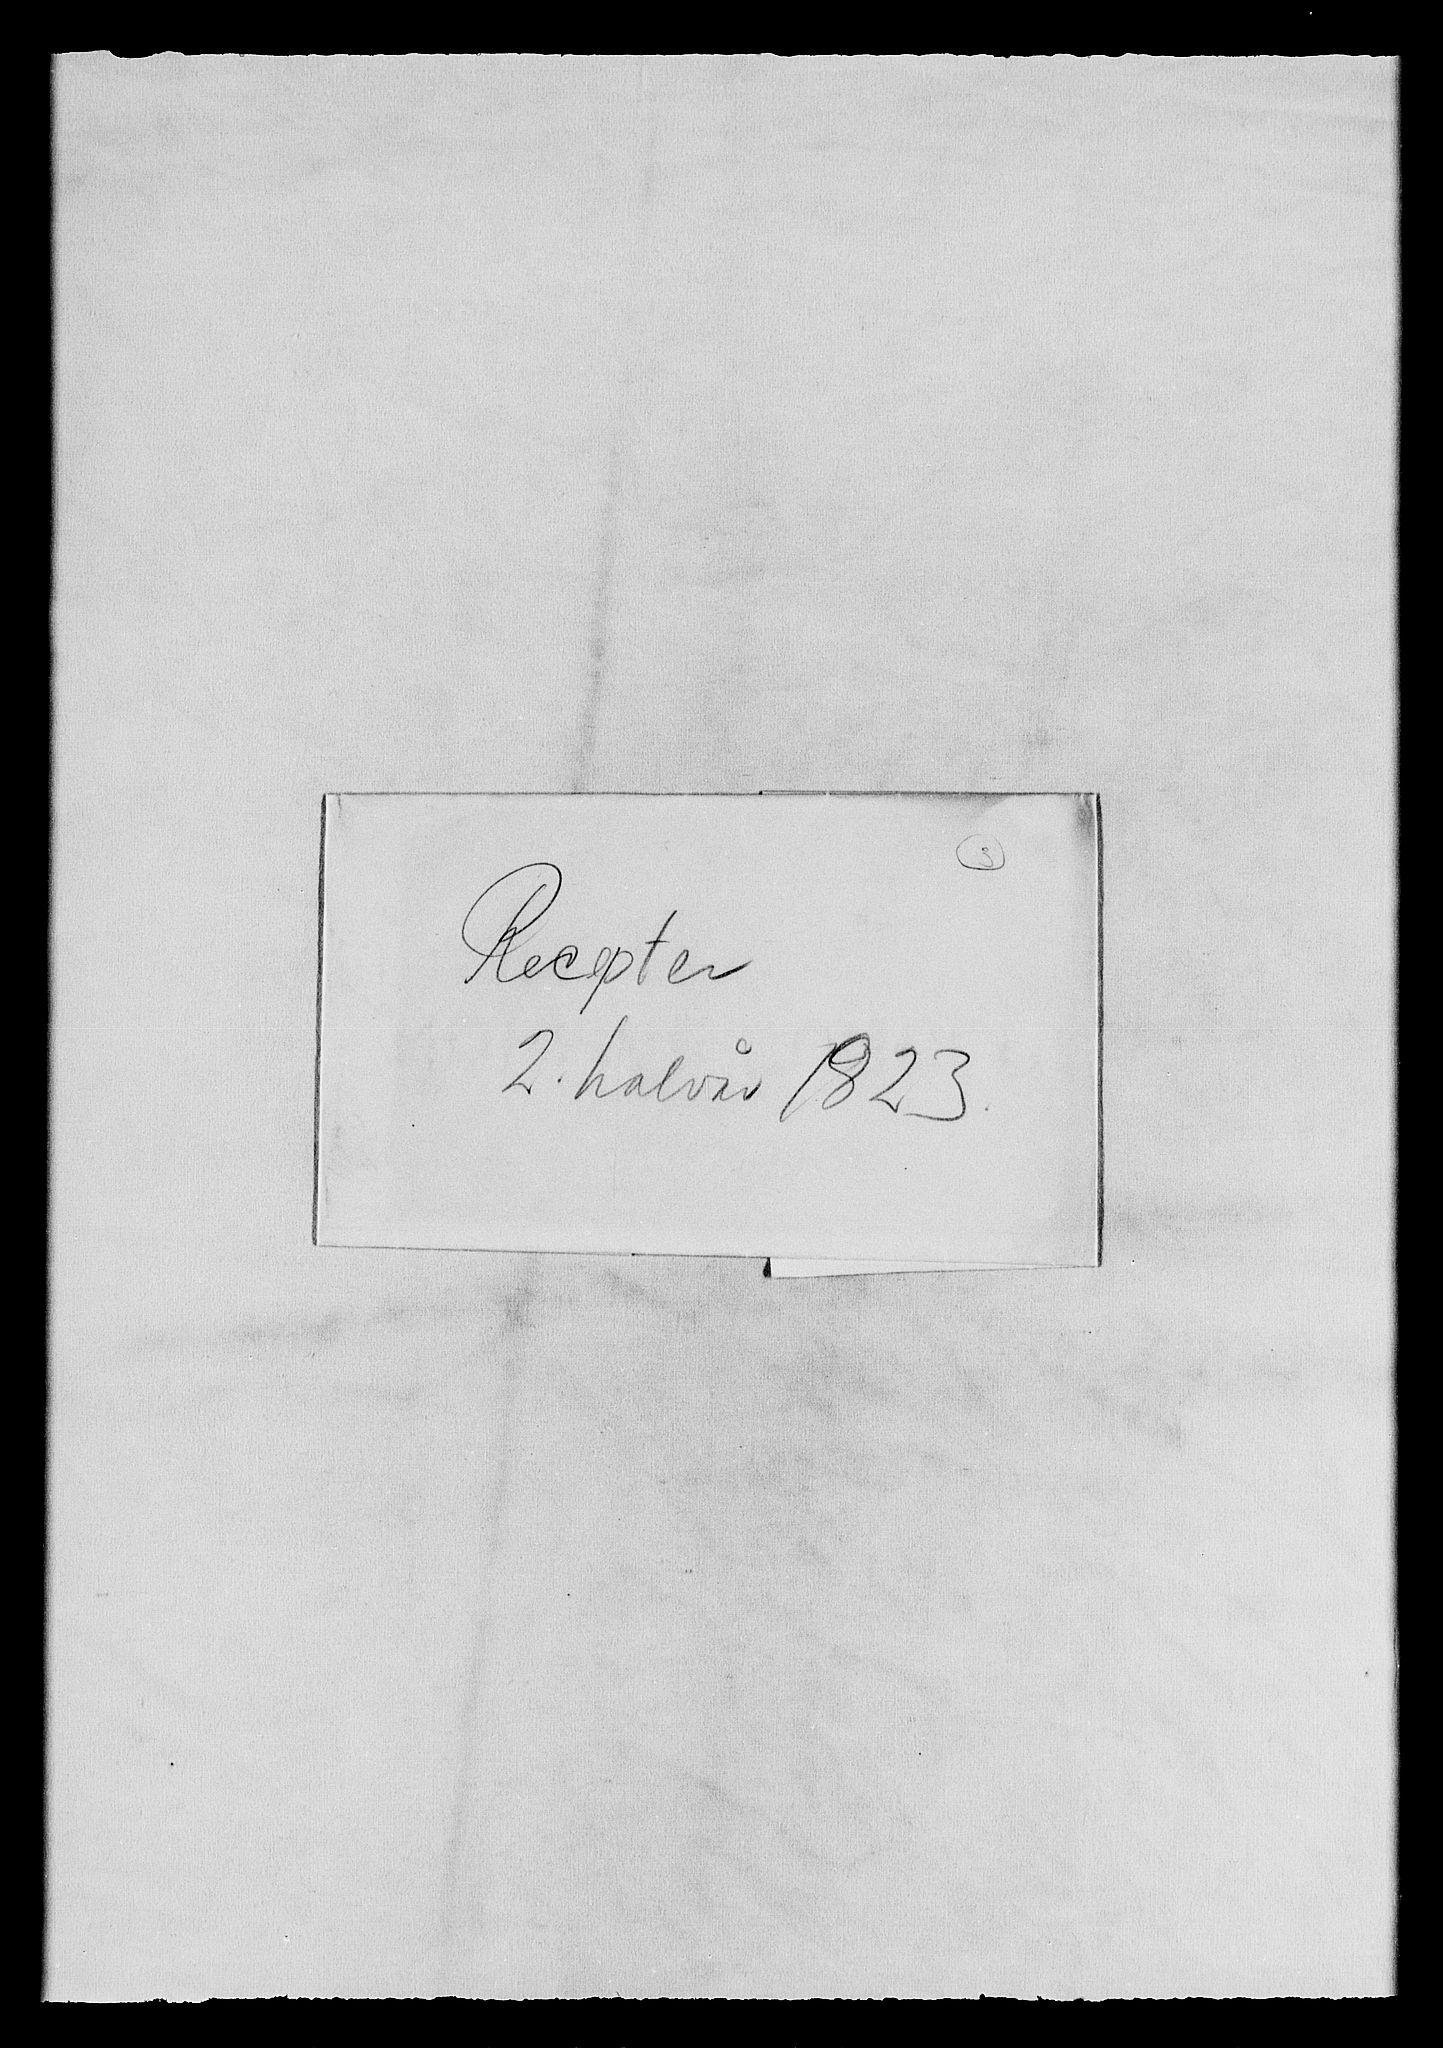 RA, Modums Blaafarveværk, G/Gh/L0380, 1825-1849, s. 2